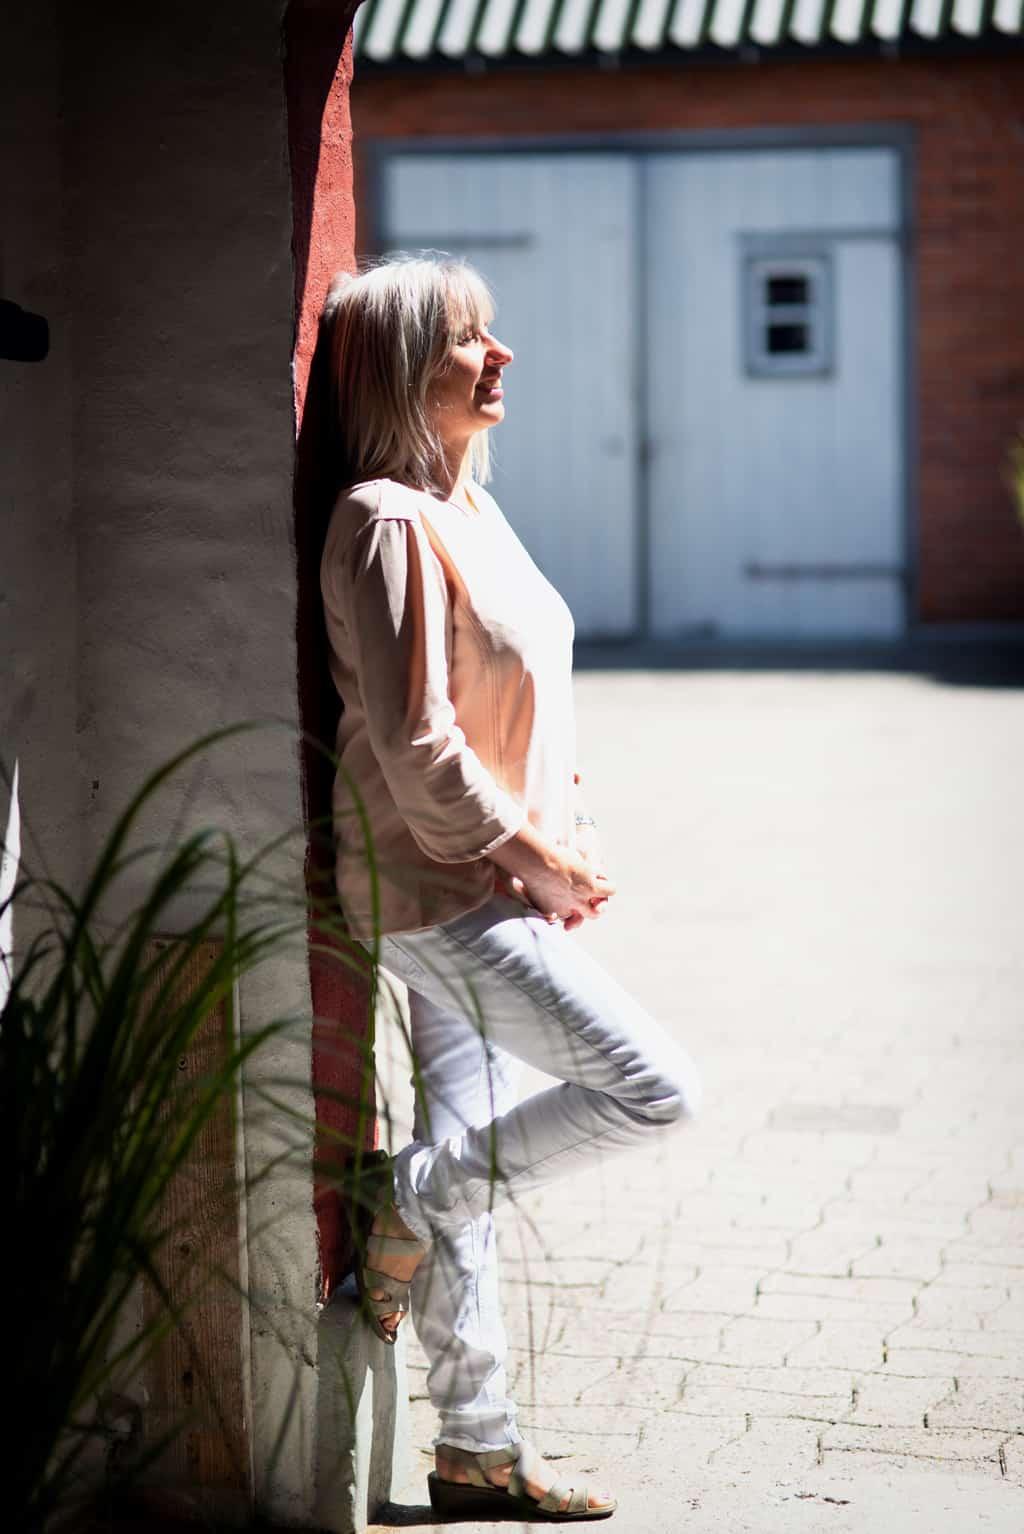 Christa i sollys